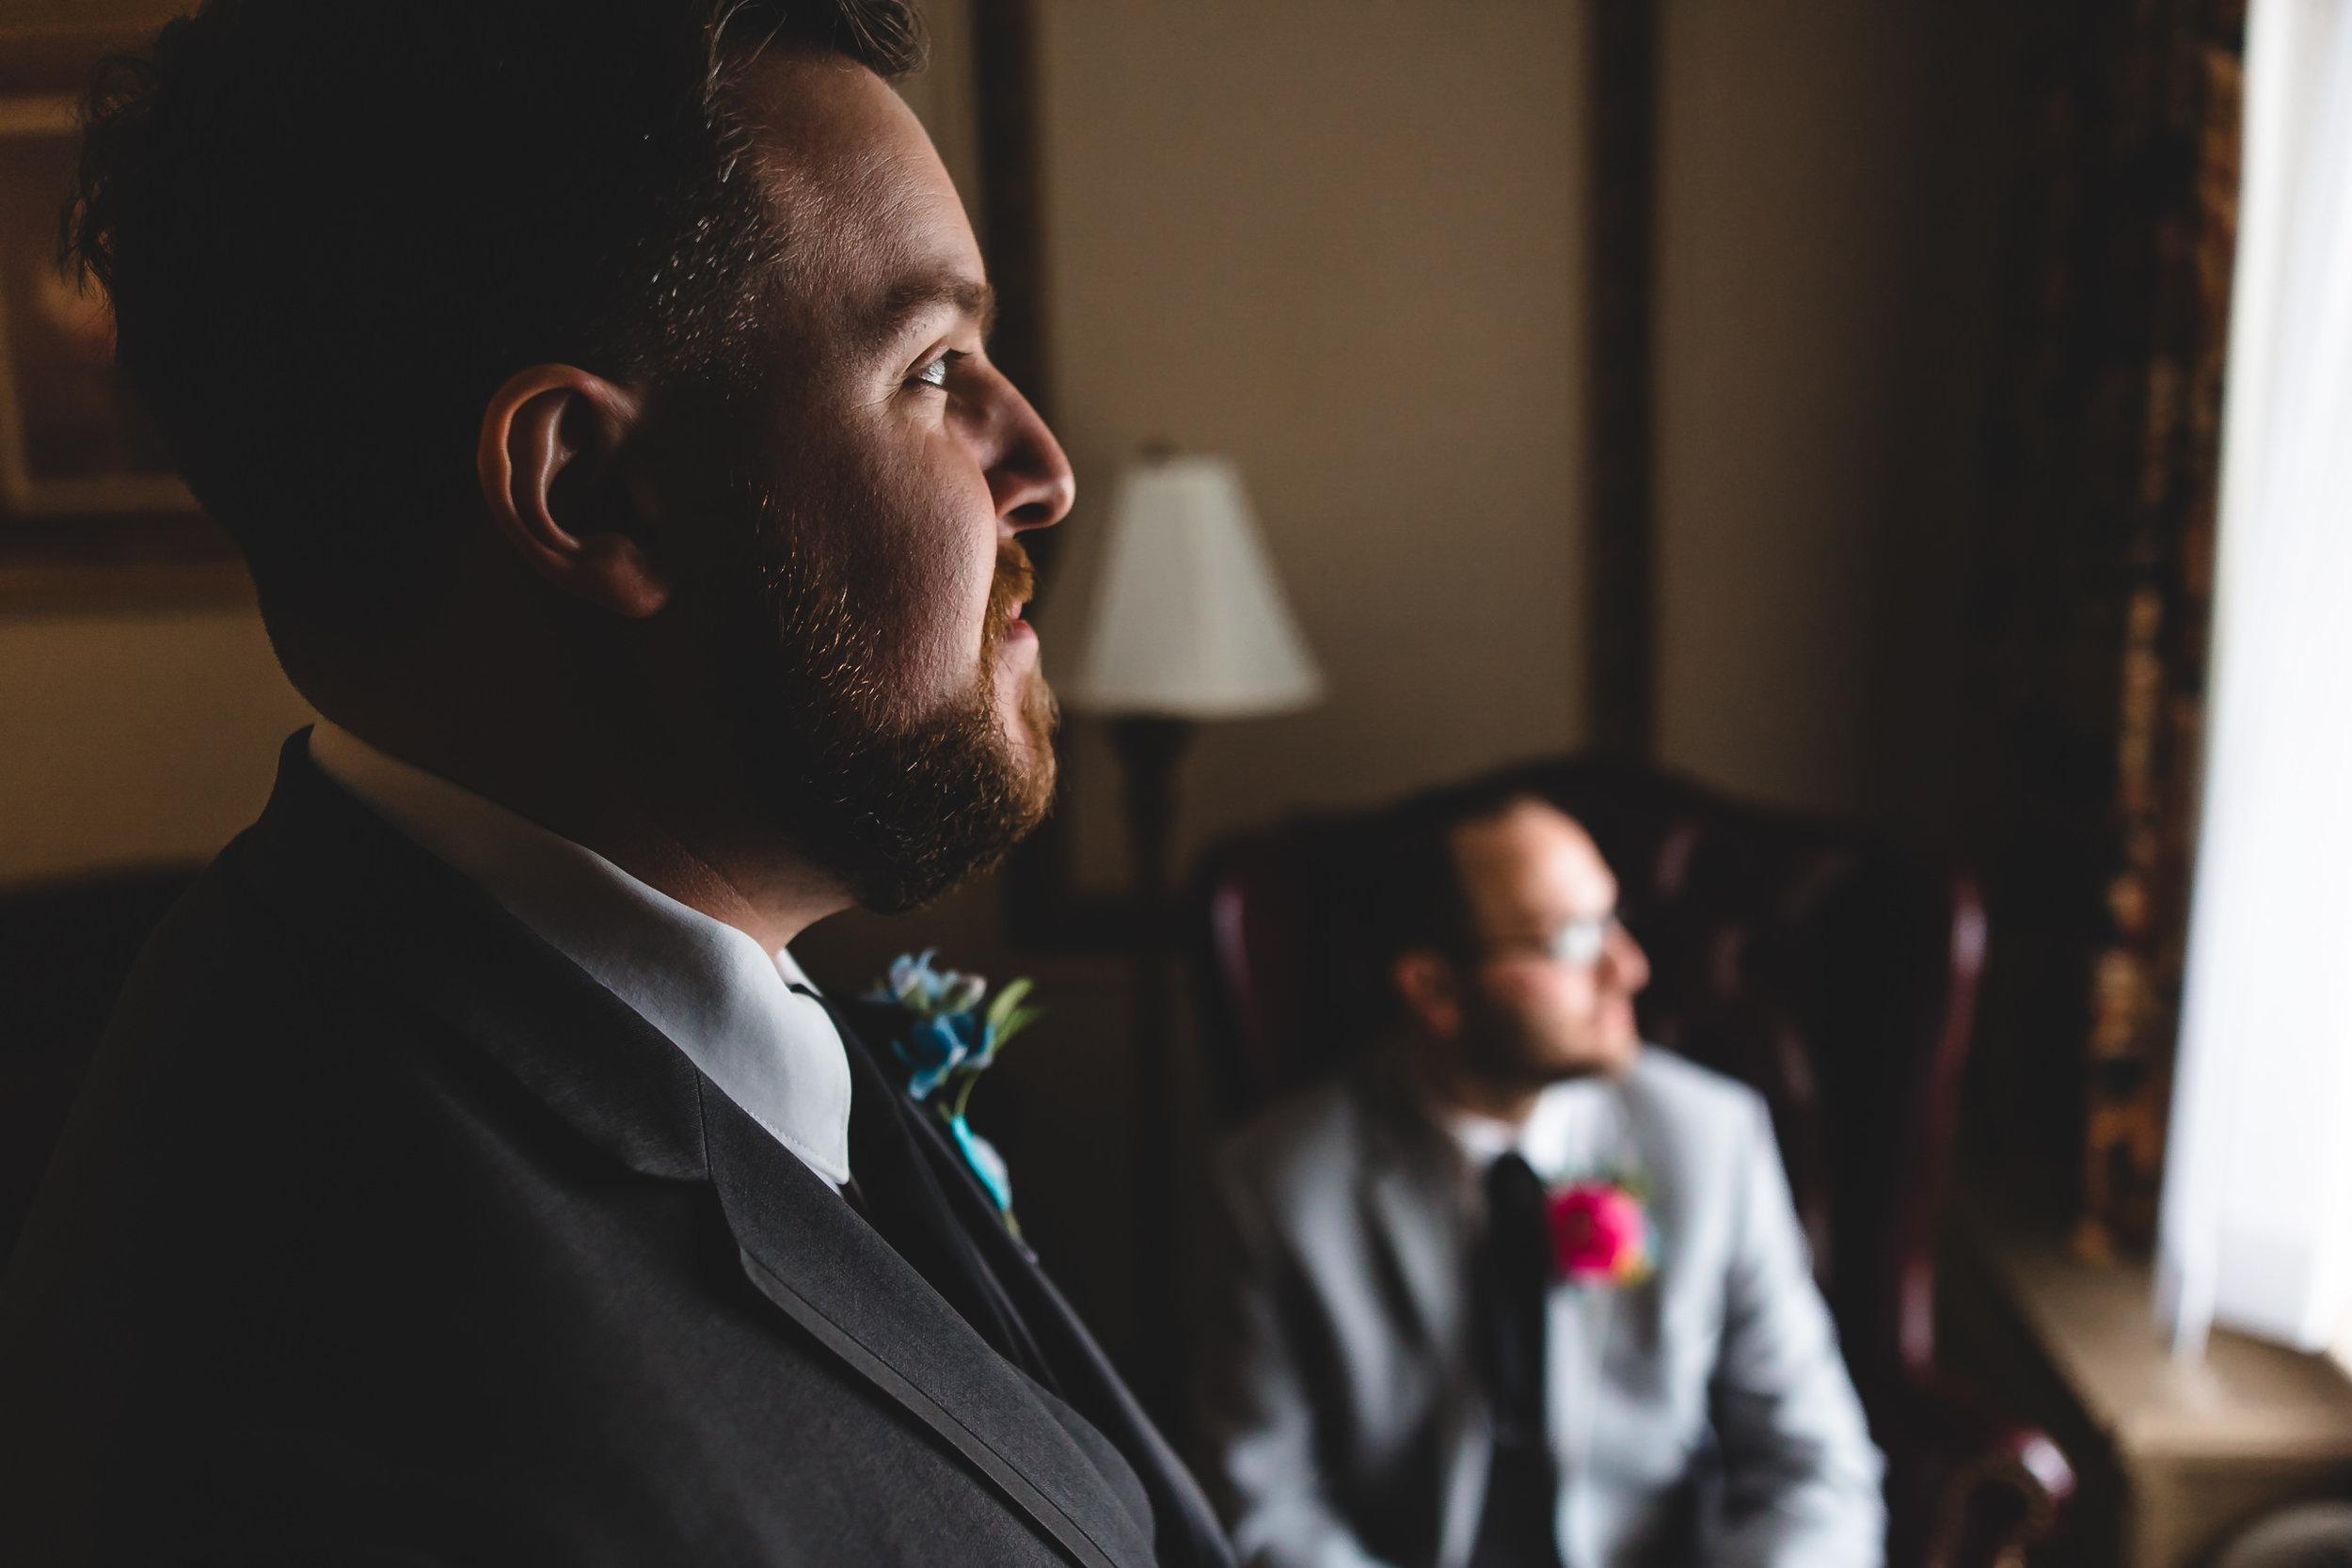 daniel_nydick_nj_photographer_headshot_wedding_event_family-4.jpg